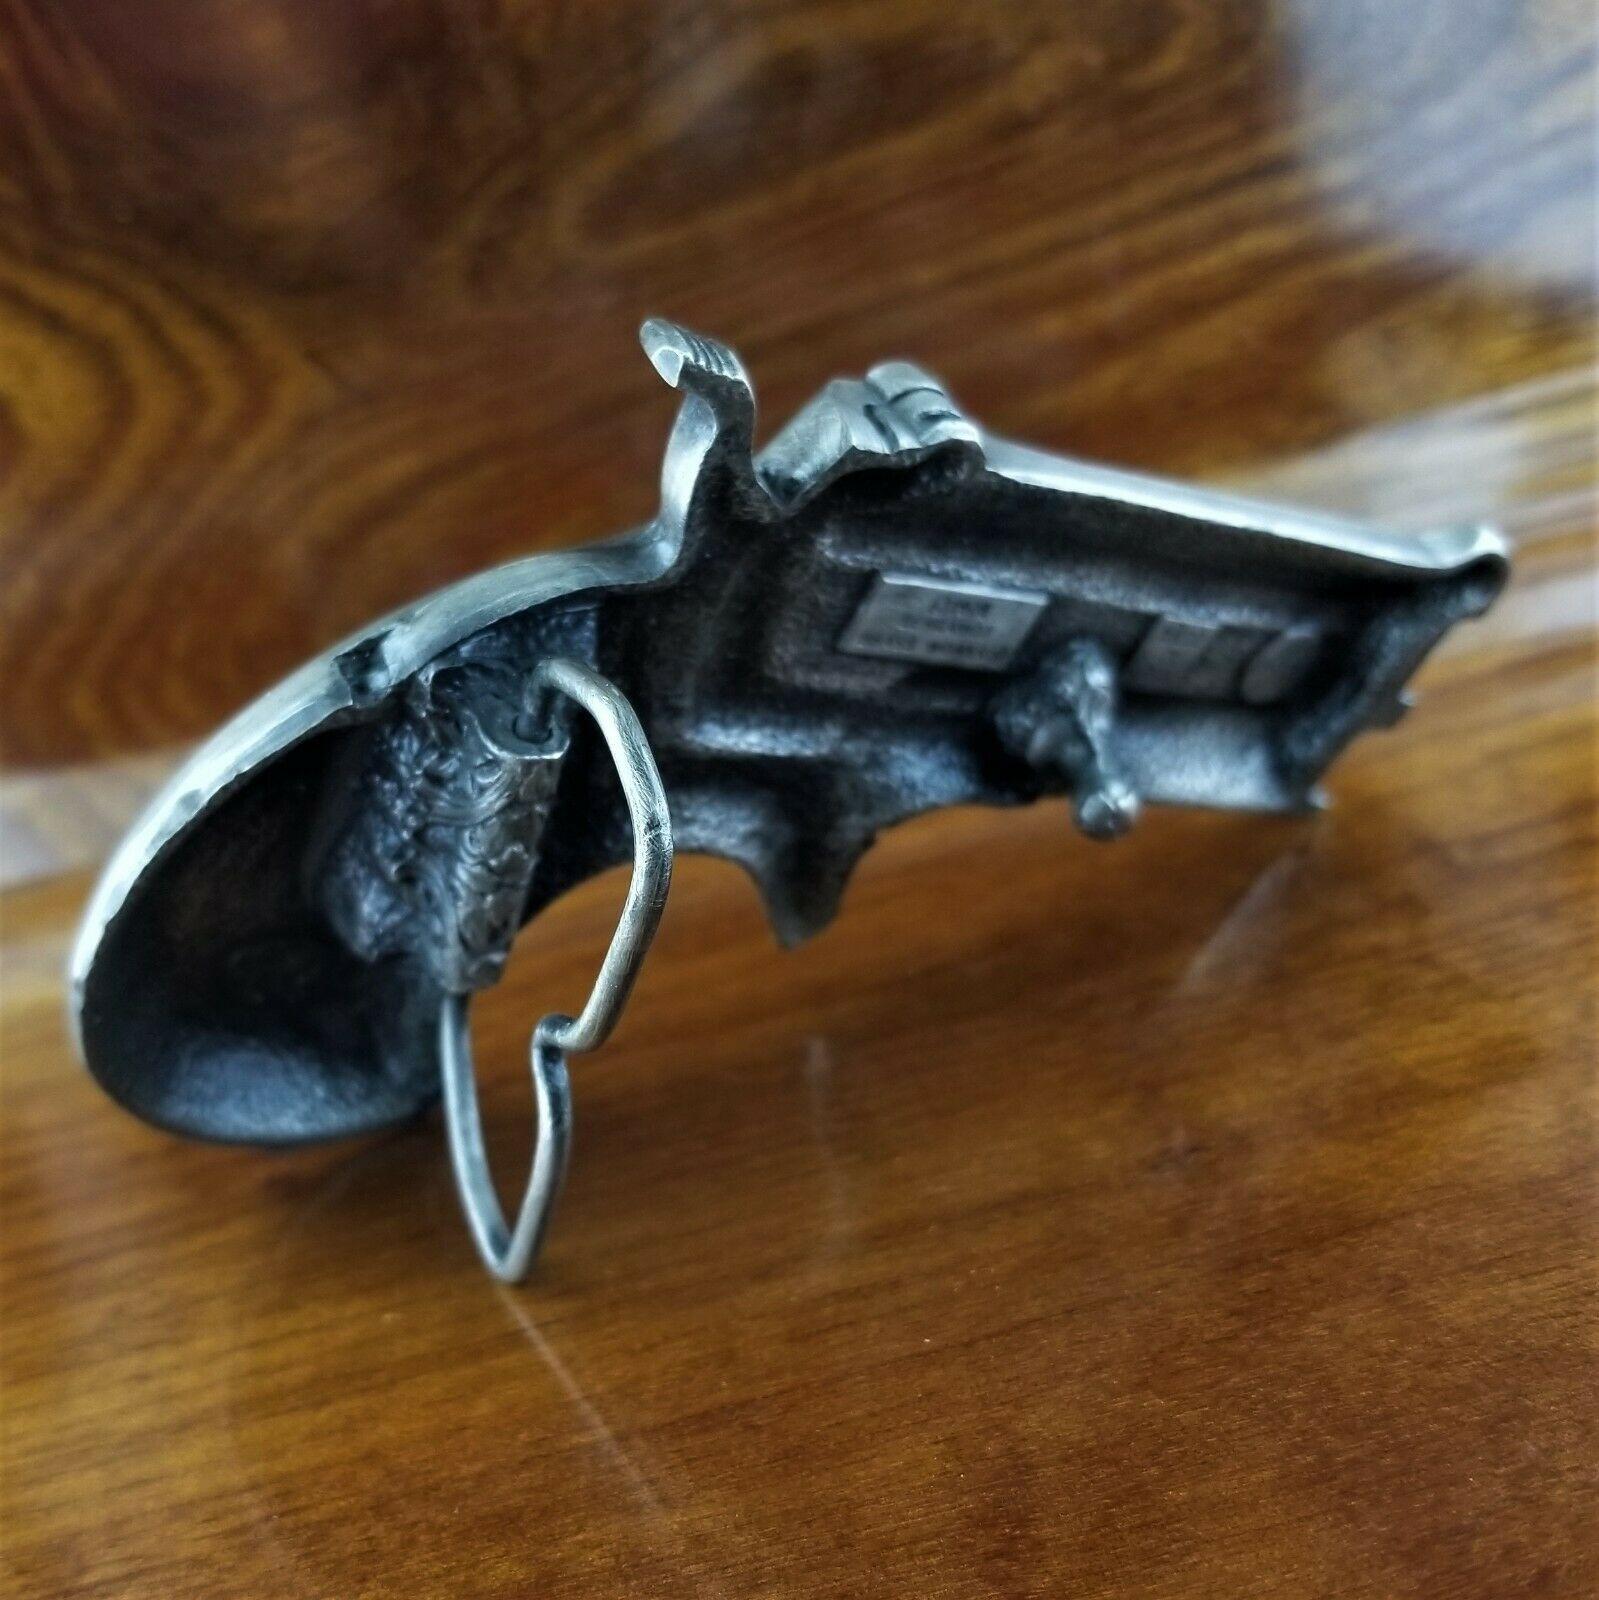 Vintage 1978 Bergamot Brass Works F-156 Derringer Hand Gun Pistol Belt Buckle image 2